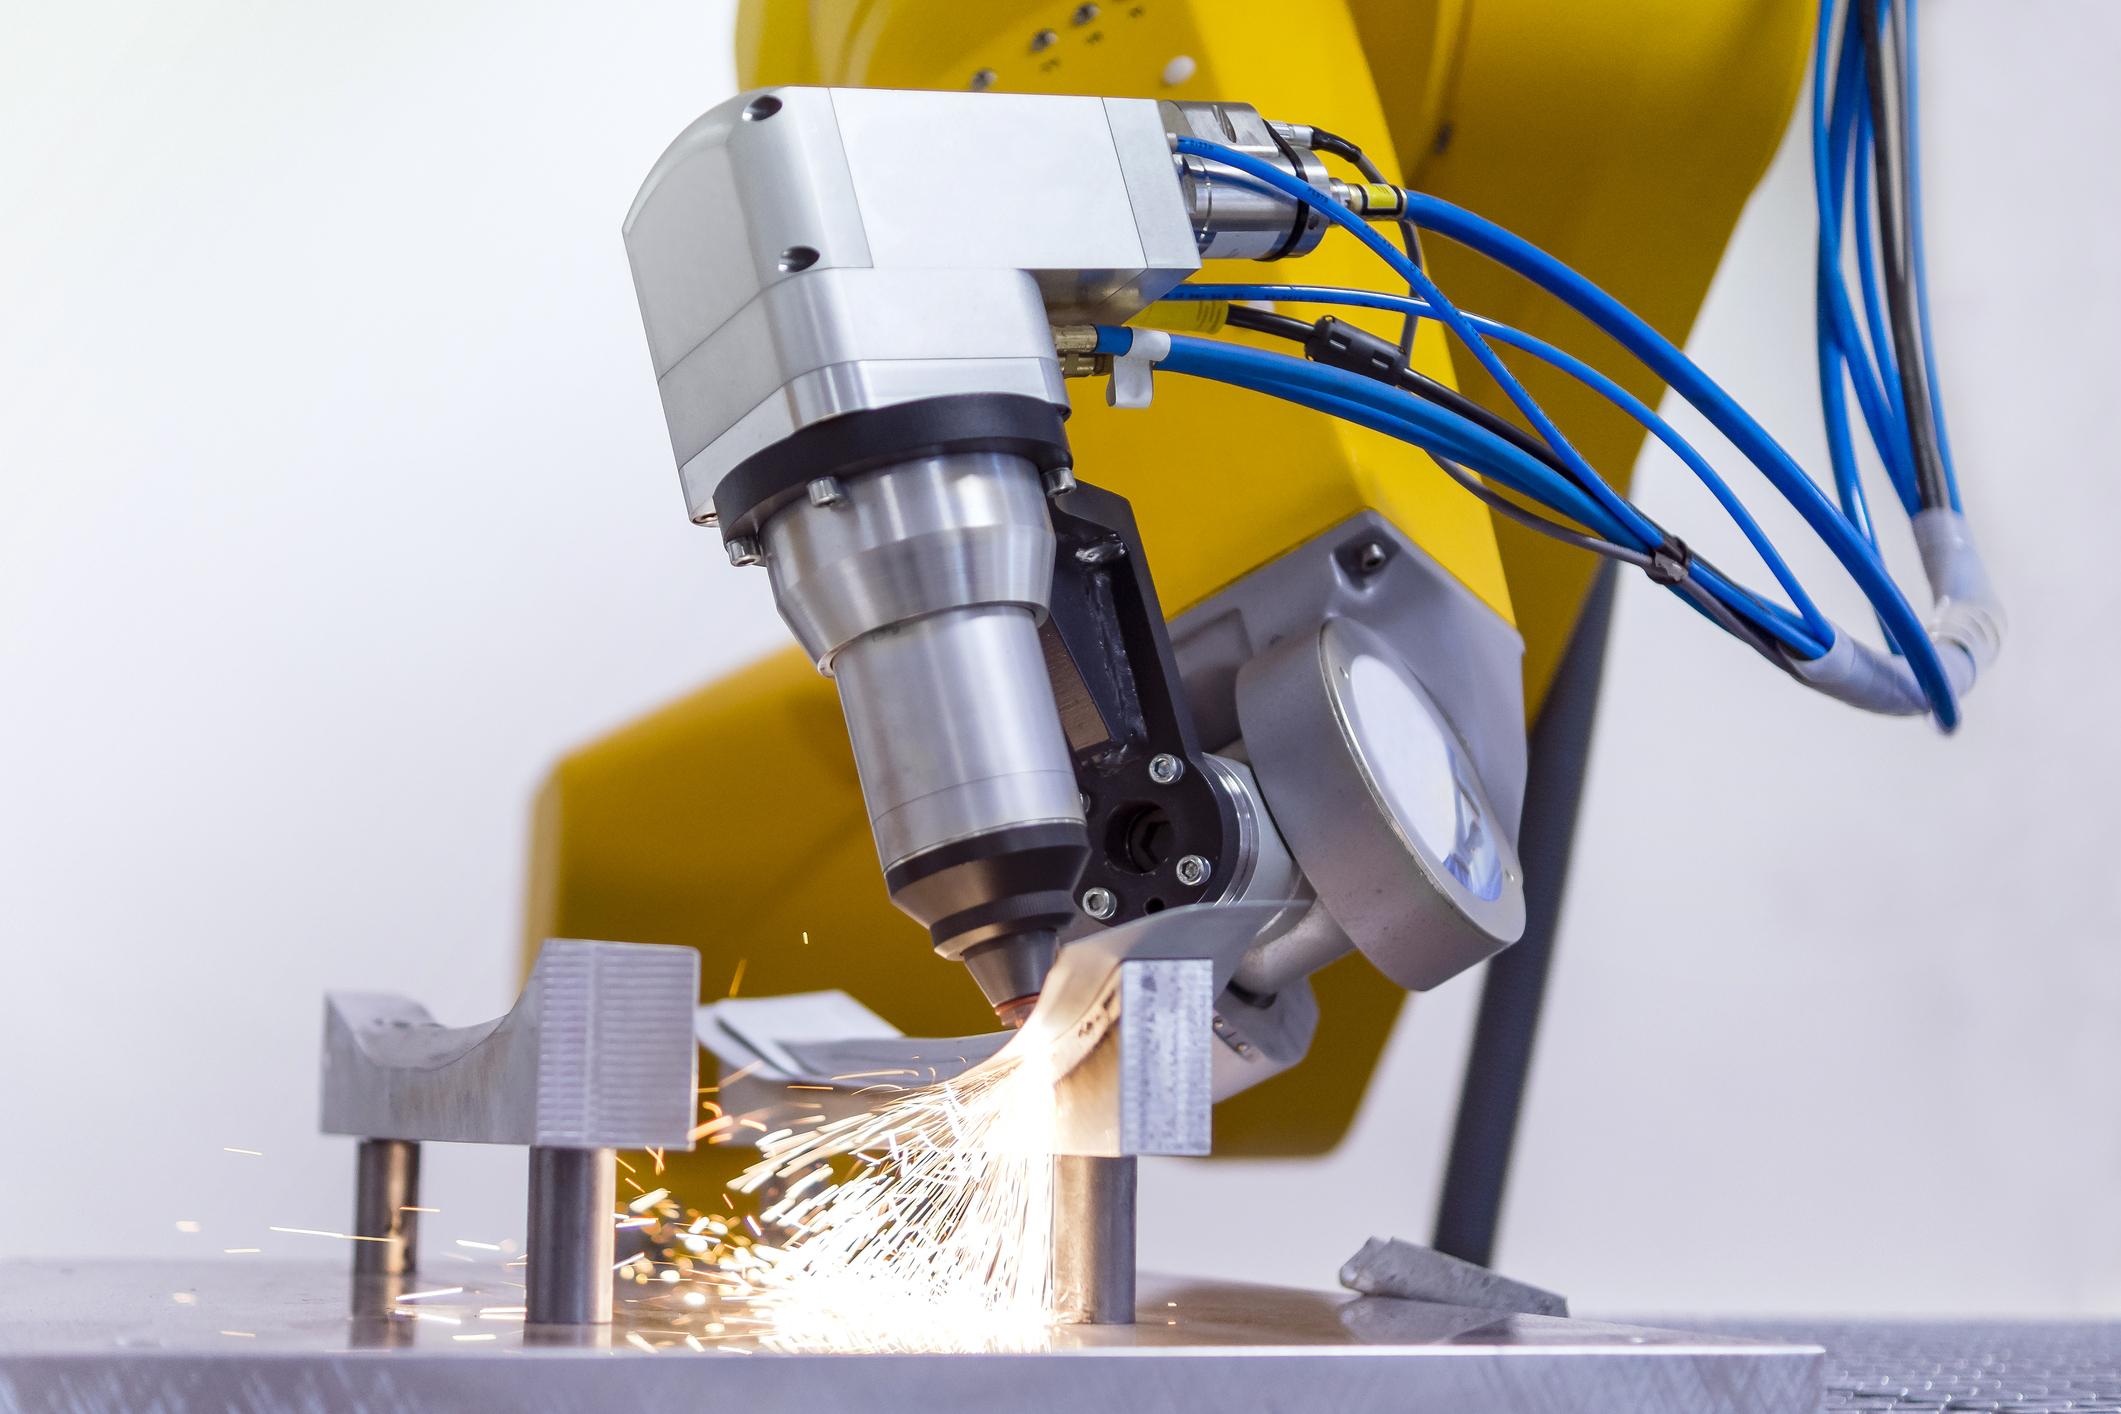 Laser on robotic arm cutting metal